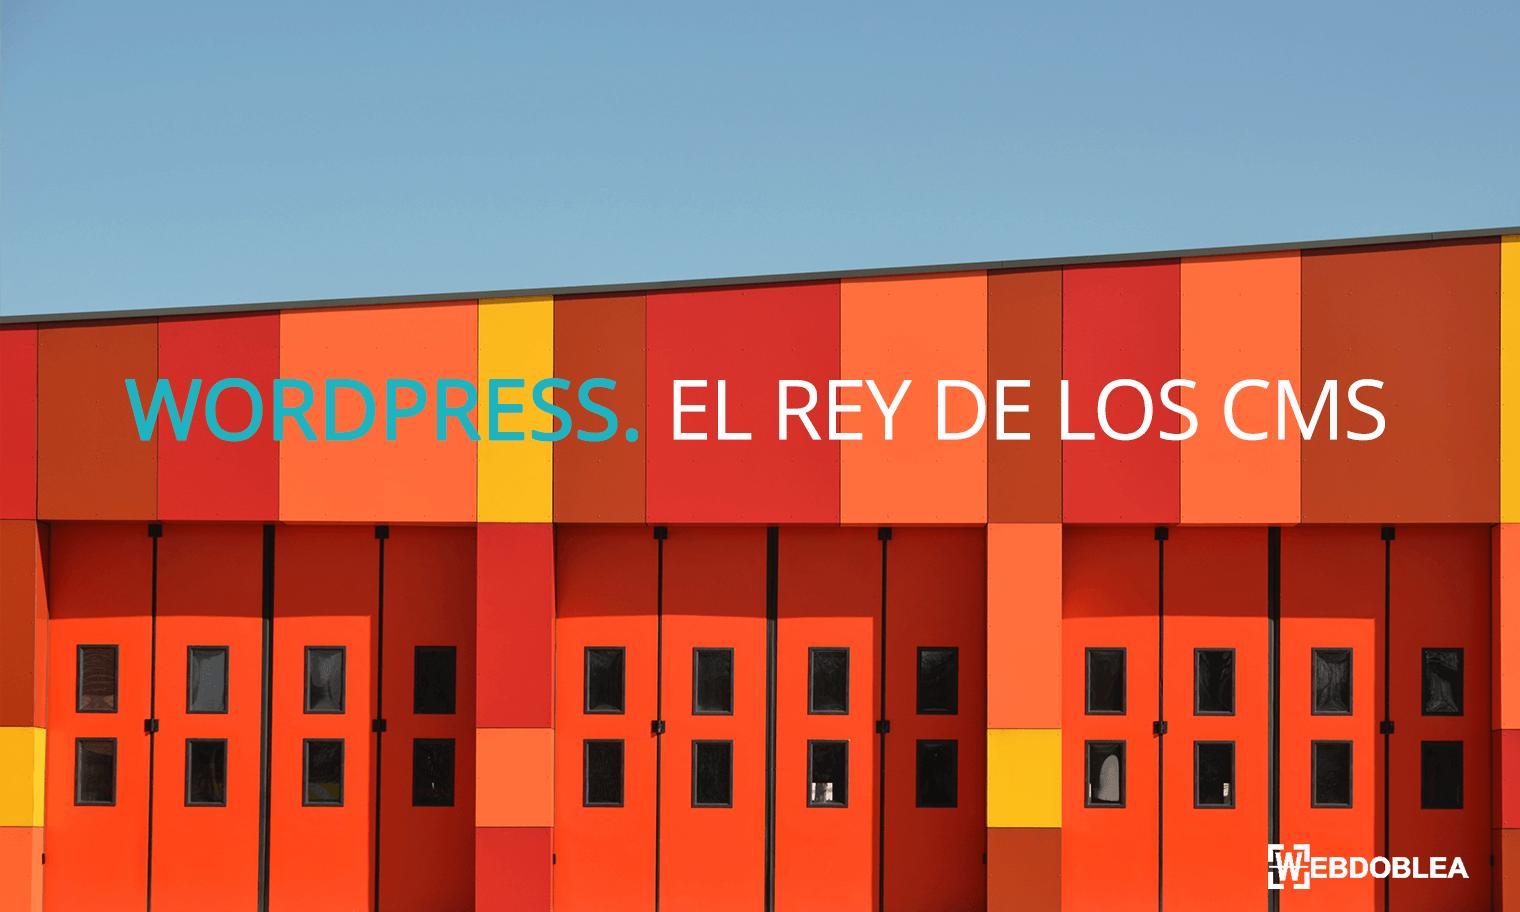 wordpress_rey_cms